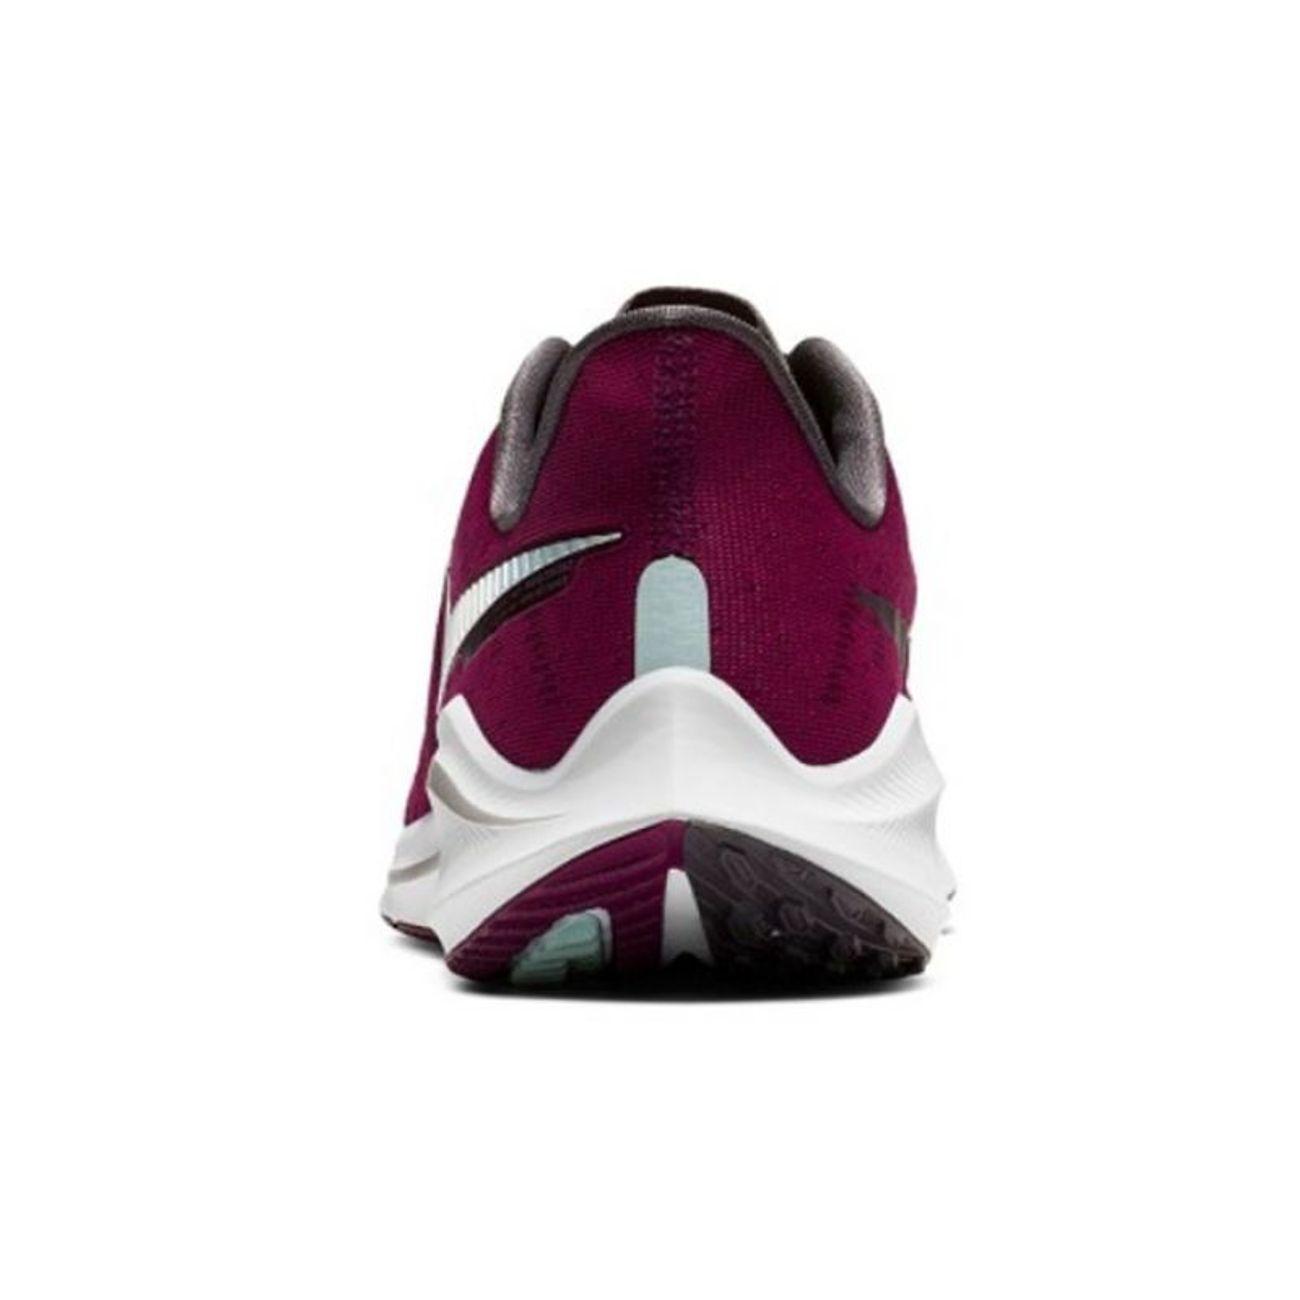 Running Zoom Violet Vomero 14 Femme Nike Niah7858 Adulte Air 600 5AjL3q4cRS